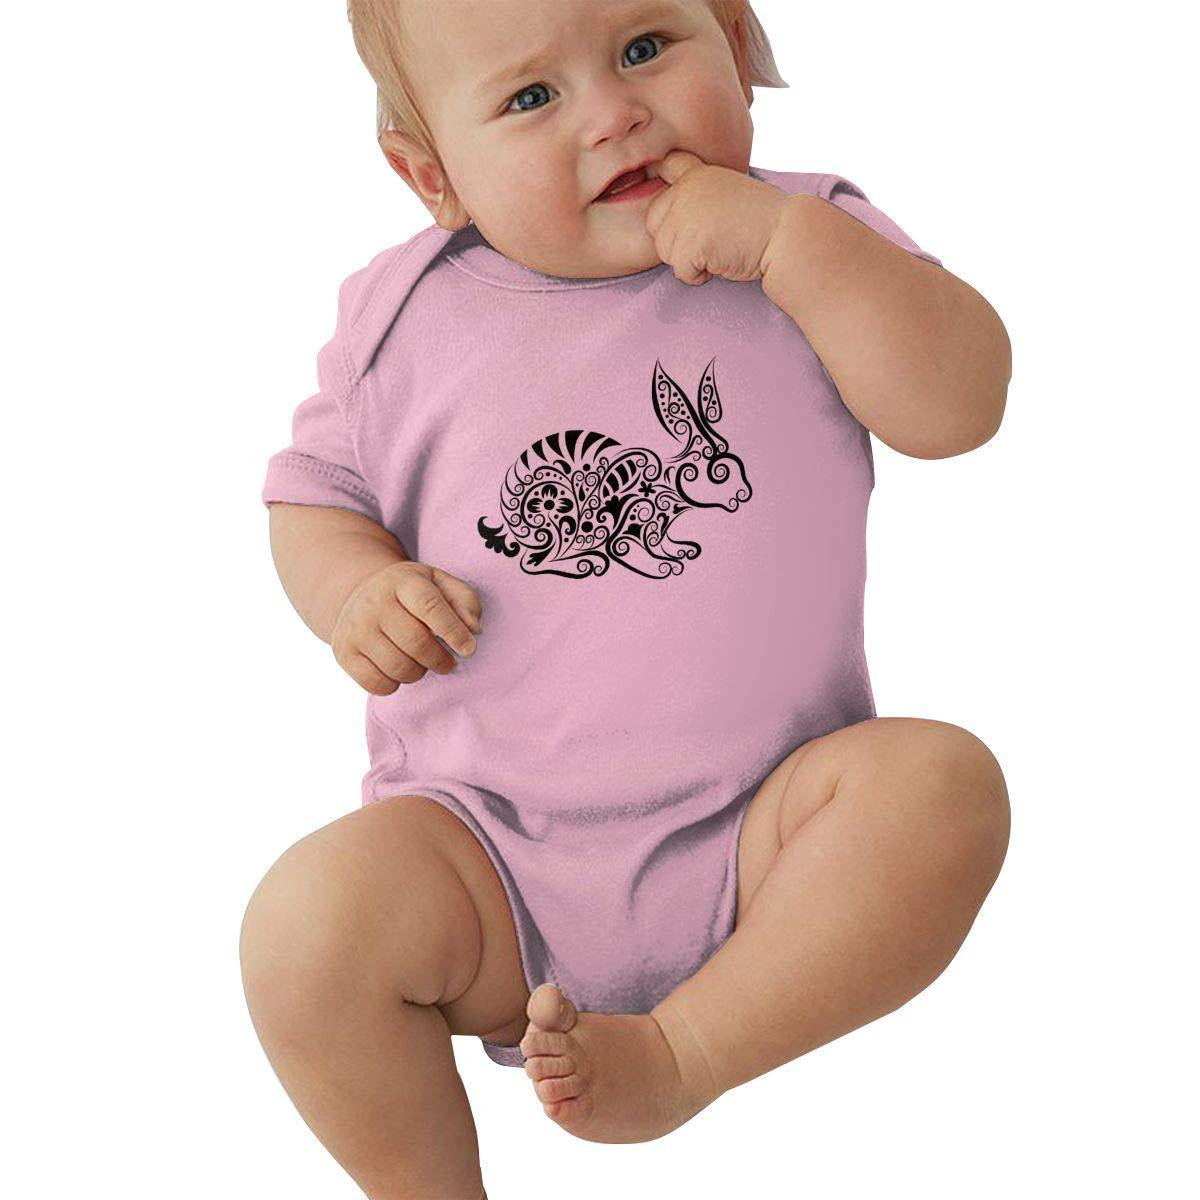 Toddler Baby Girls Bodysuit Short-Sleeve Onesie Rabbit Silhouette Print Rompers Winter Pajamas